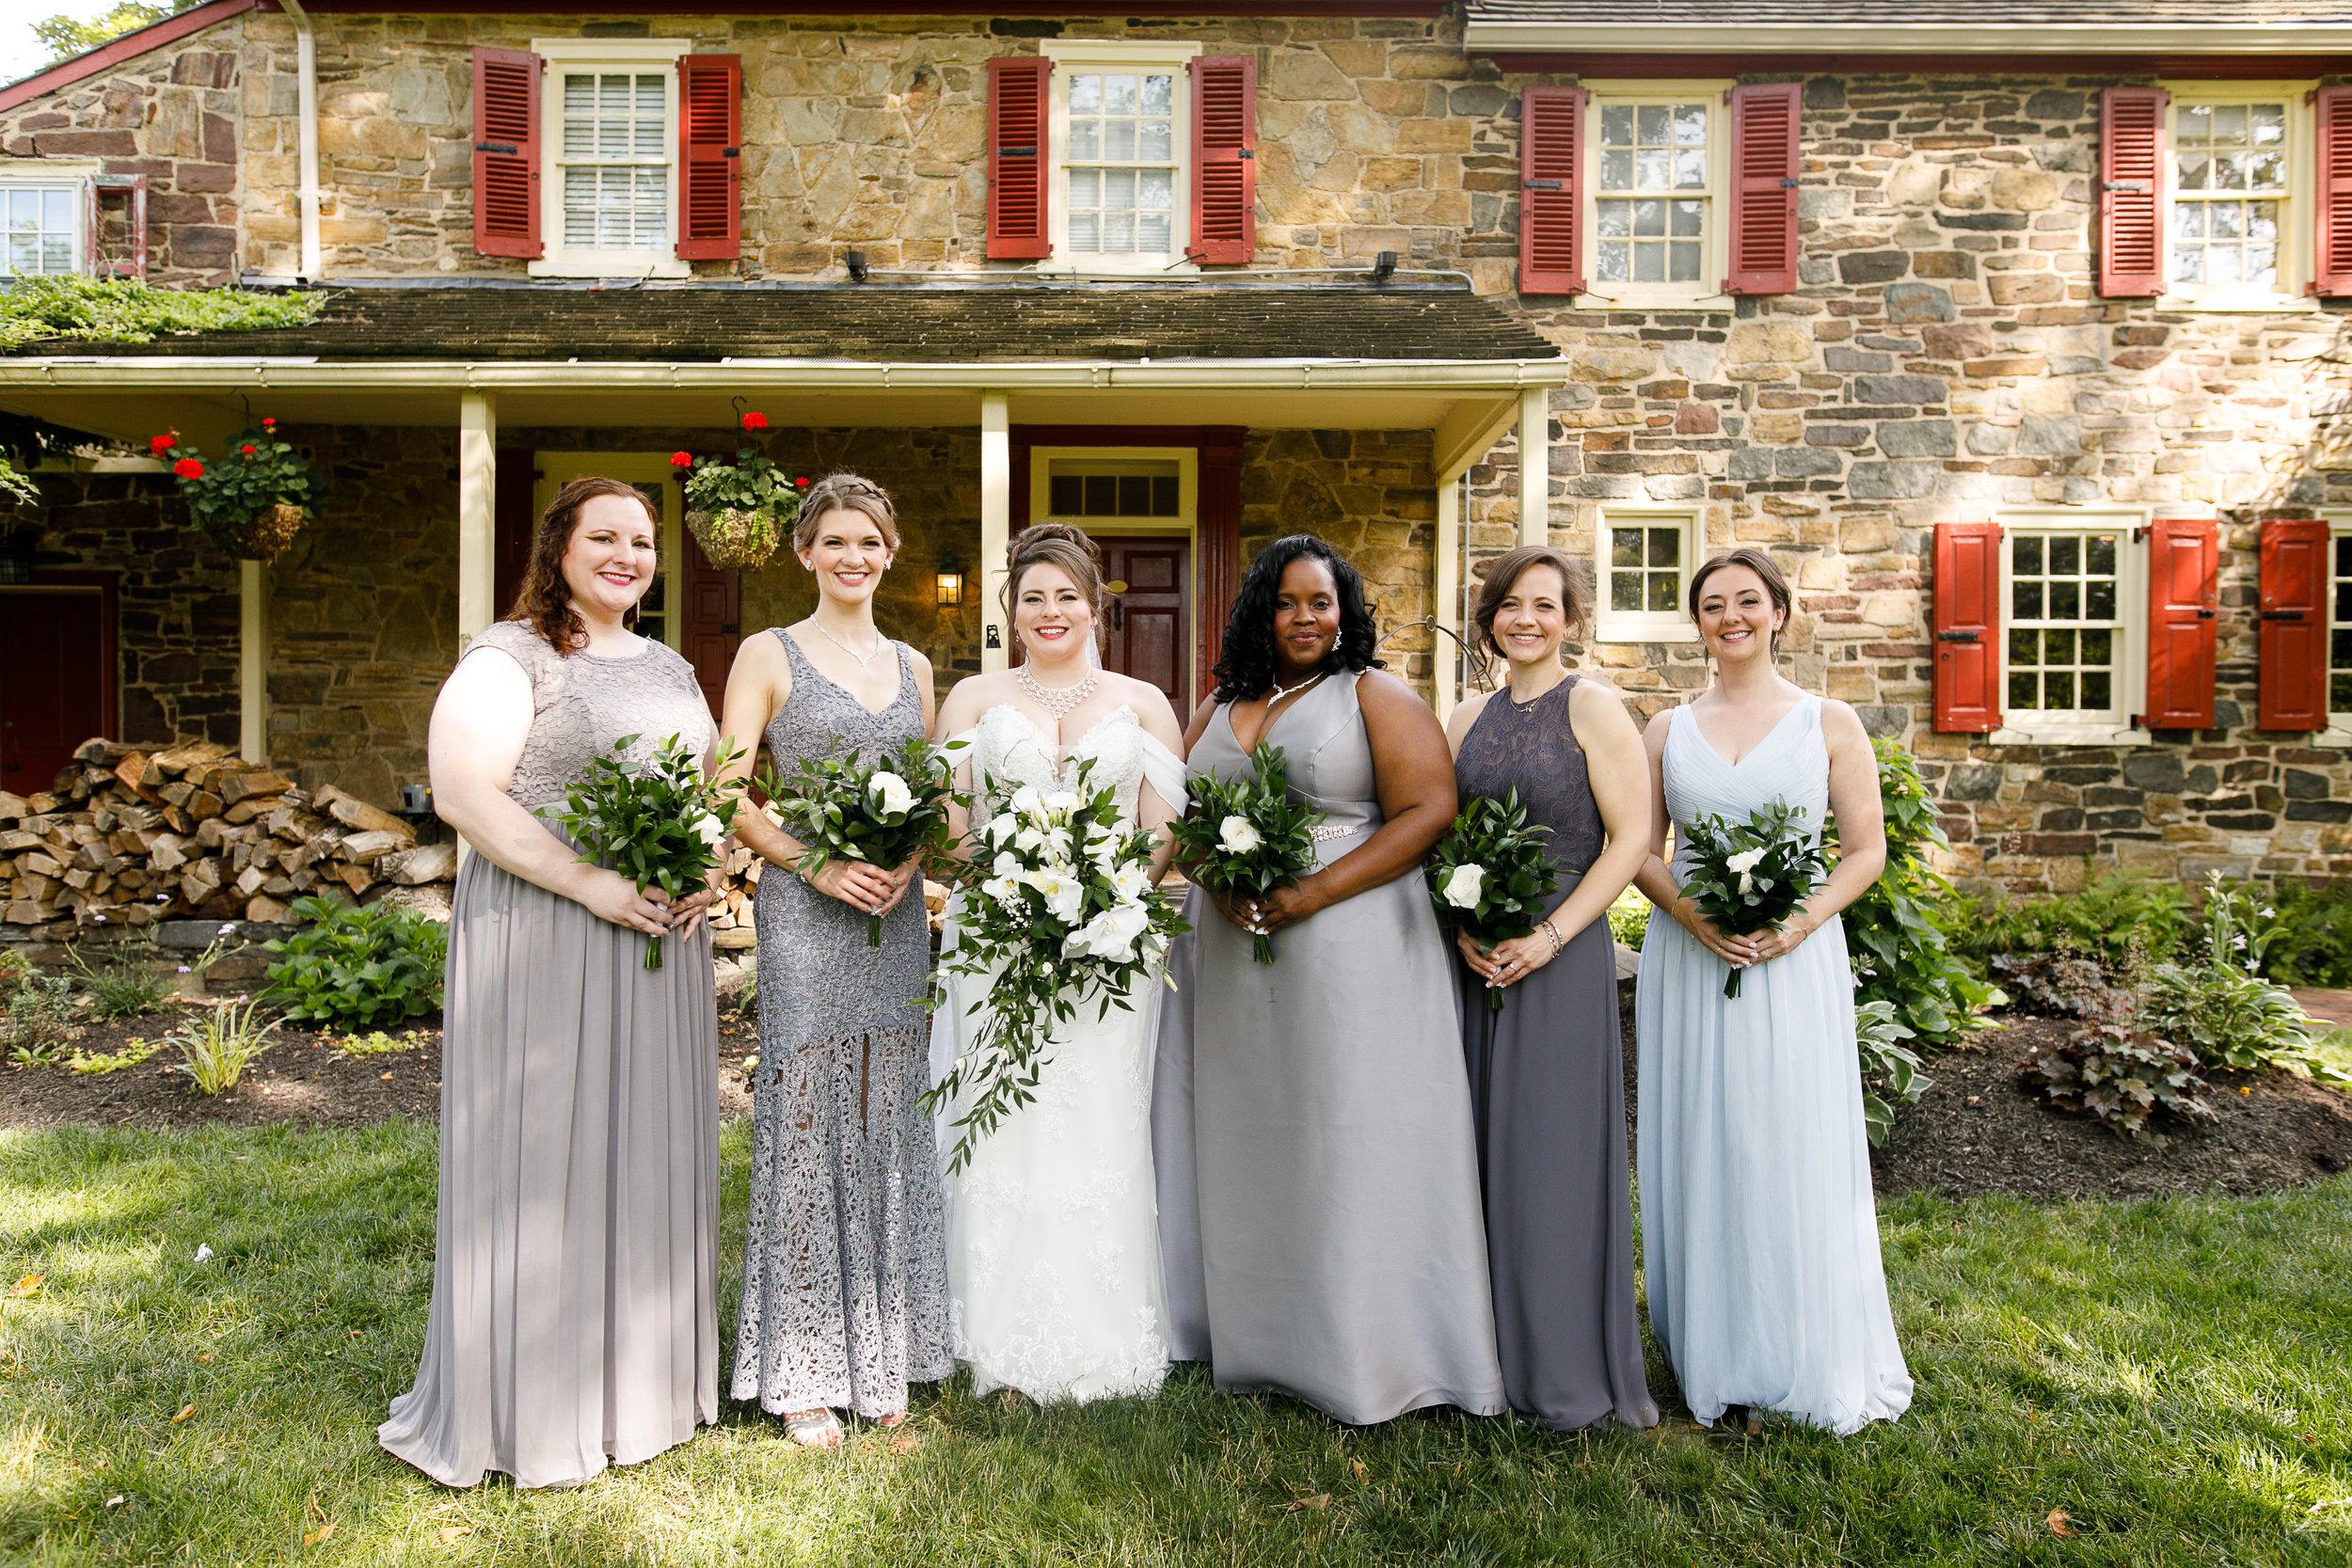 Wedding at Joseph Ambler In Bucks County PA15.jpg